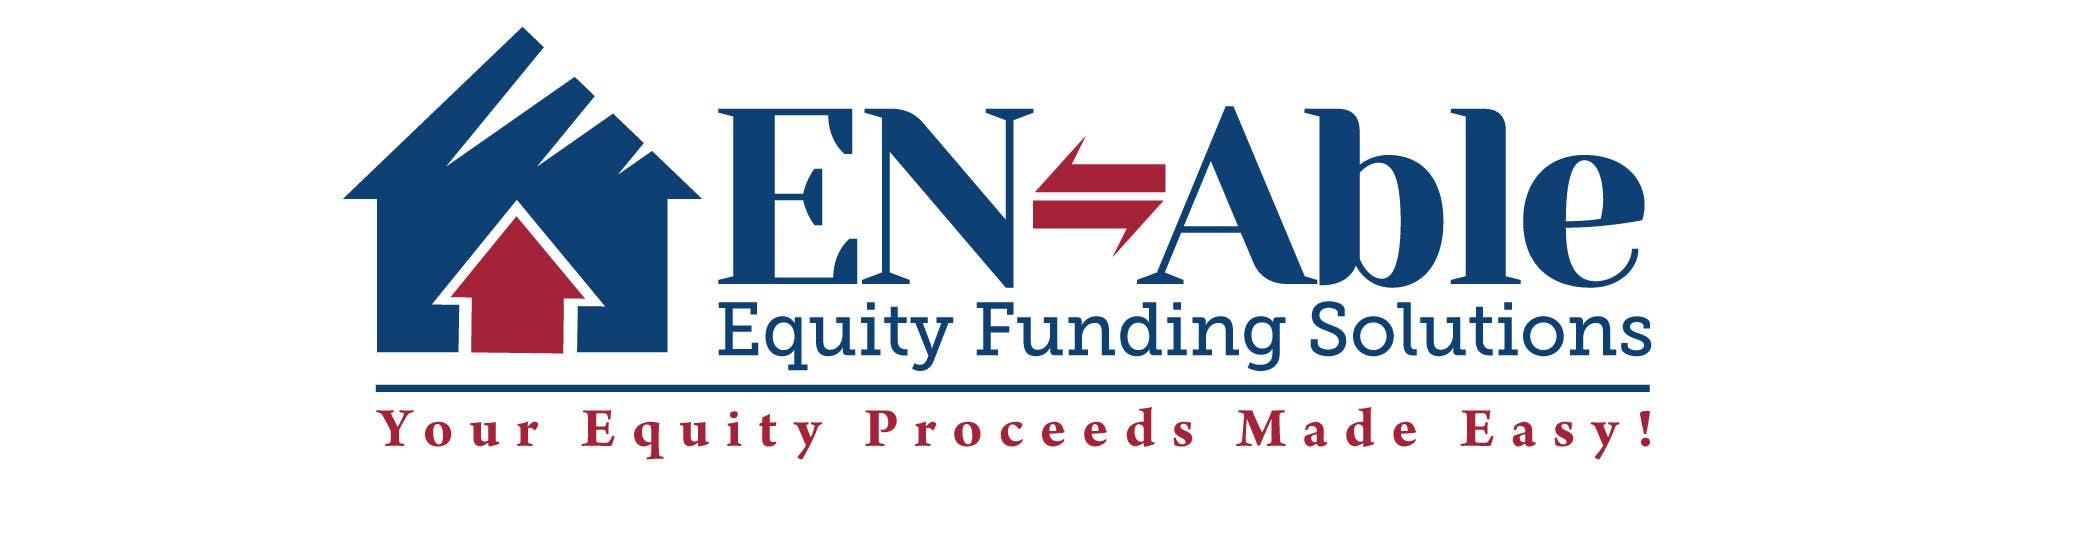 Penyertaan Peraduan #                                        18                                      untuk                                         Design a Logo for EN-Able Equity Funding Solutions (Pty) Ltd